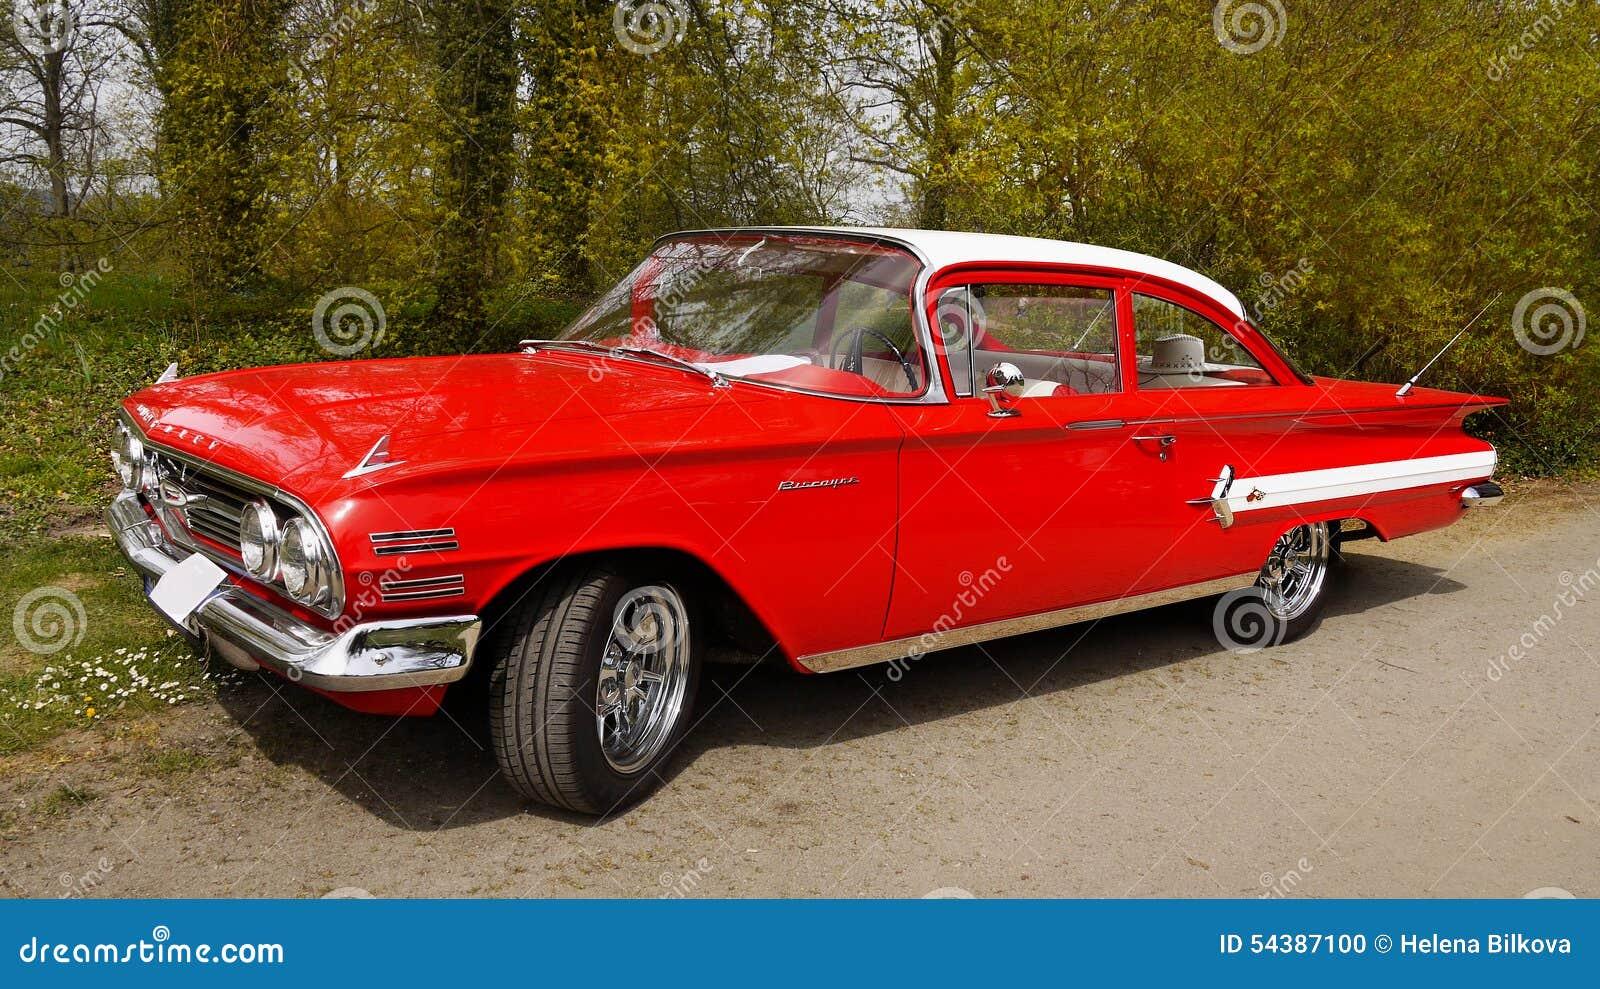 Vintage american cars near central park havana cuba 14 for American classic